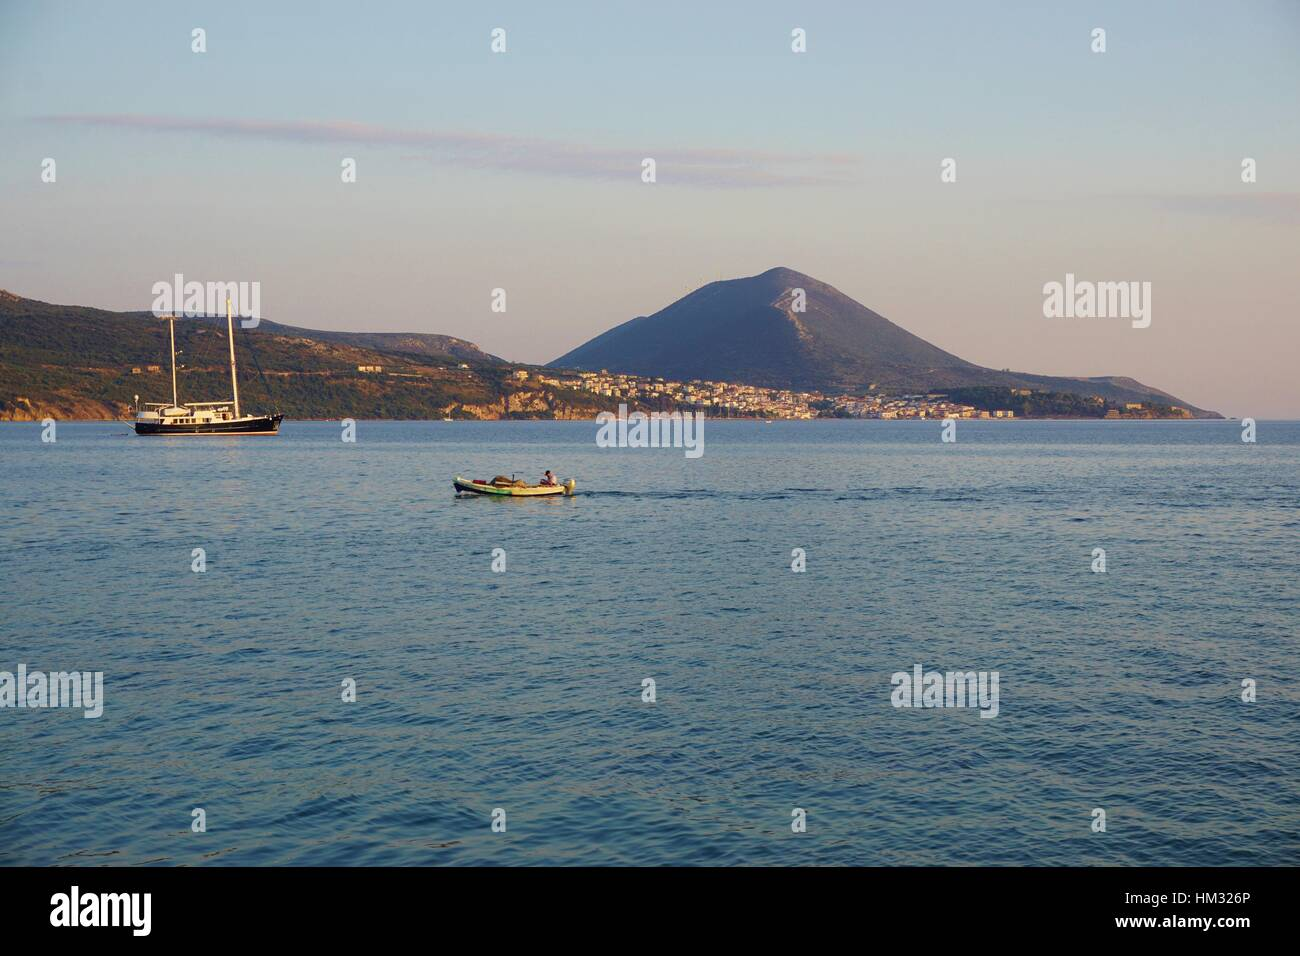 View of Navarino Bay overlooking Pylos in Messenia, Greece - Stock Image